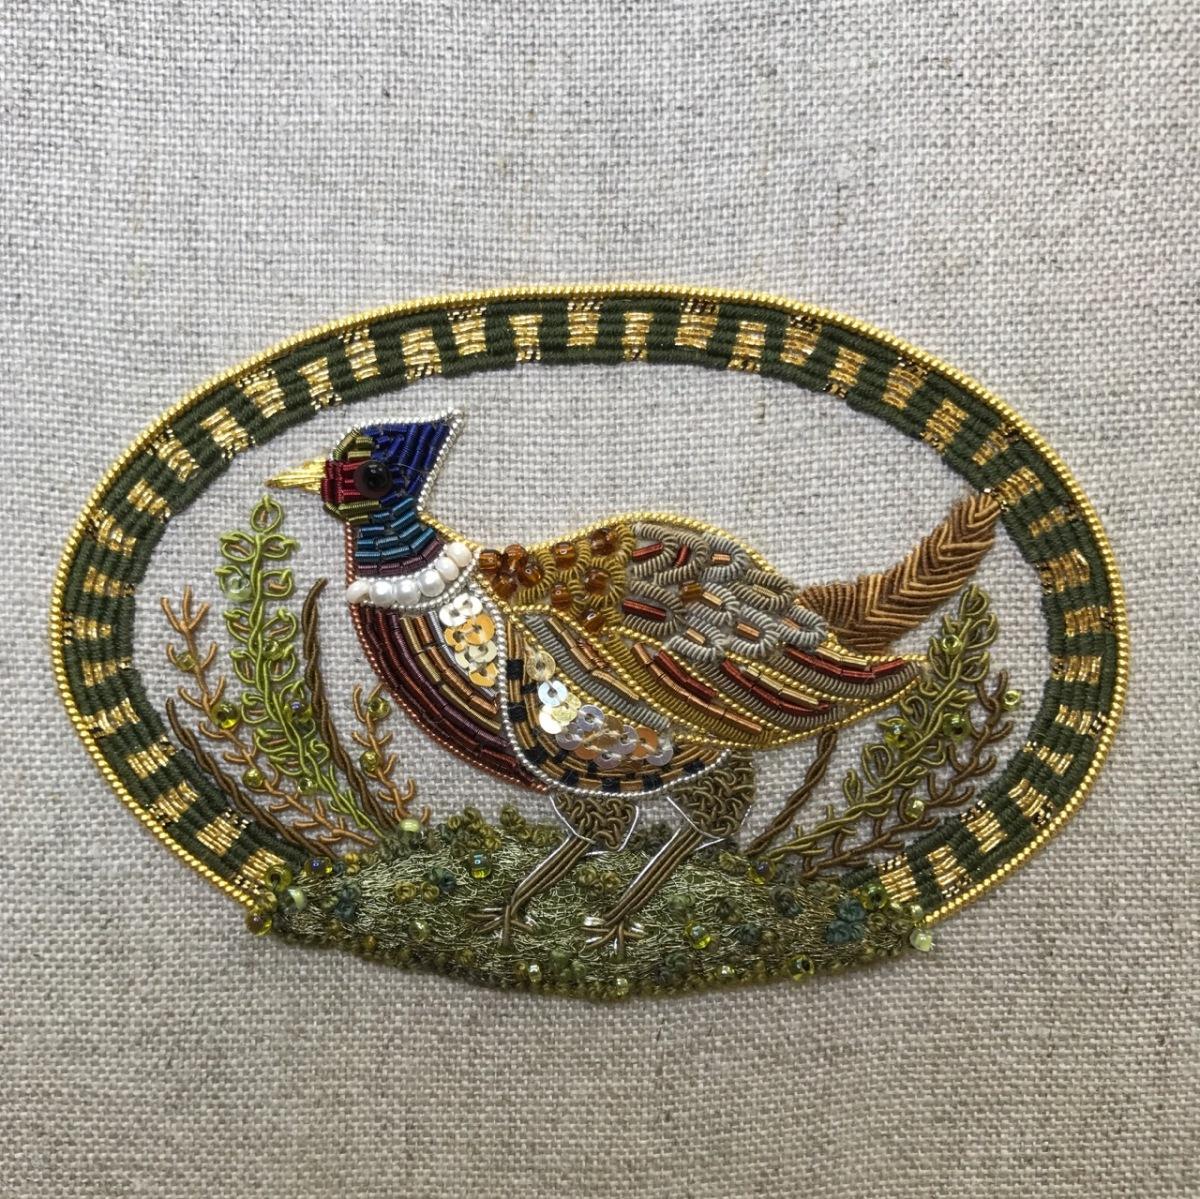 My goldwork pheasant